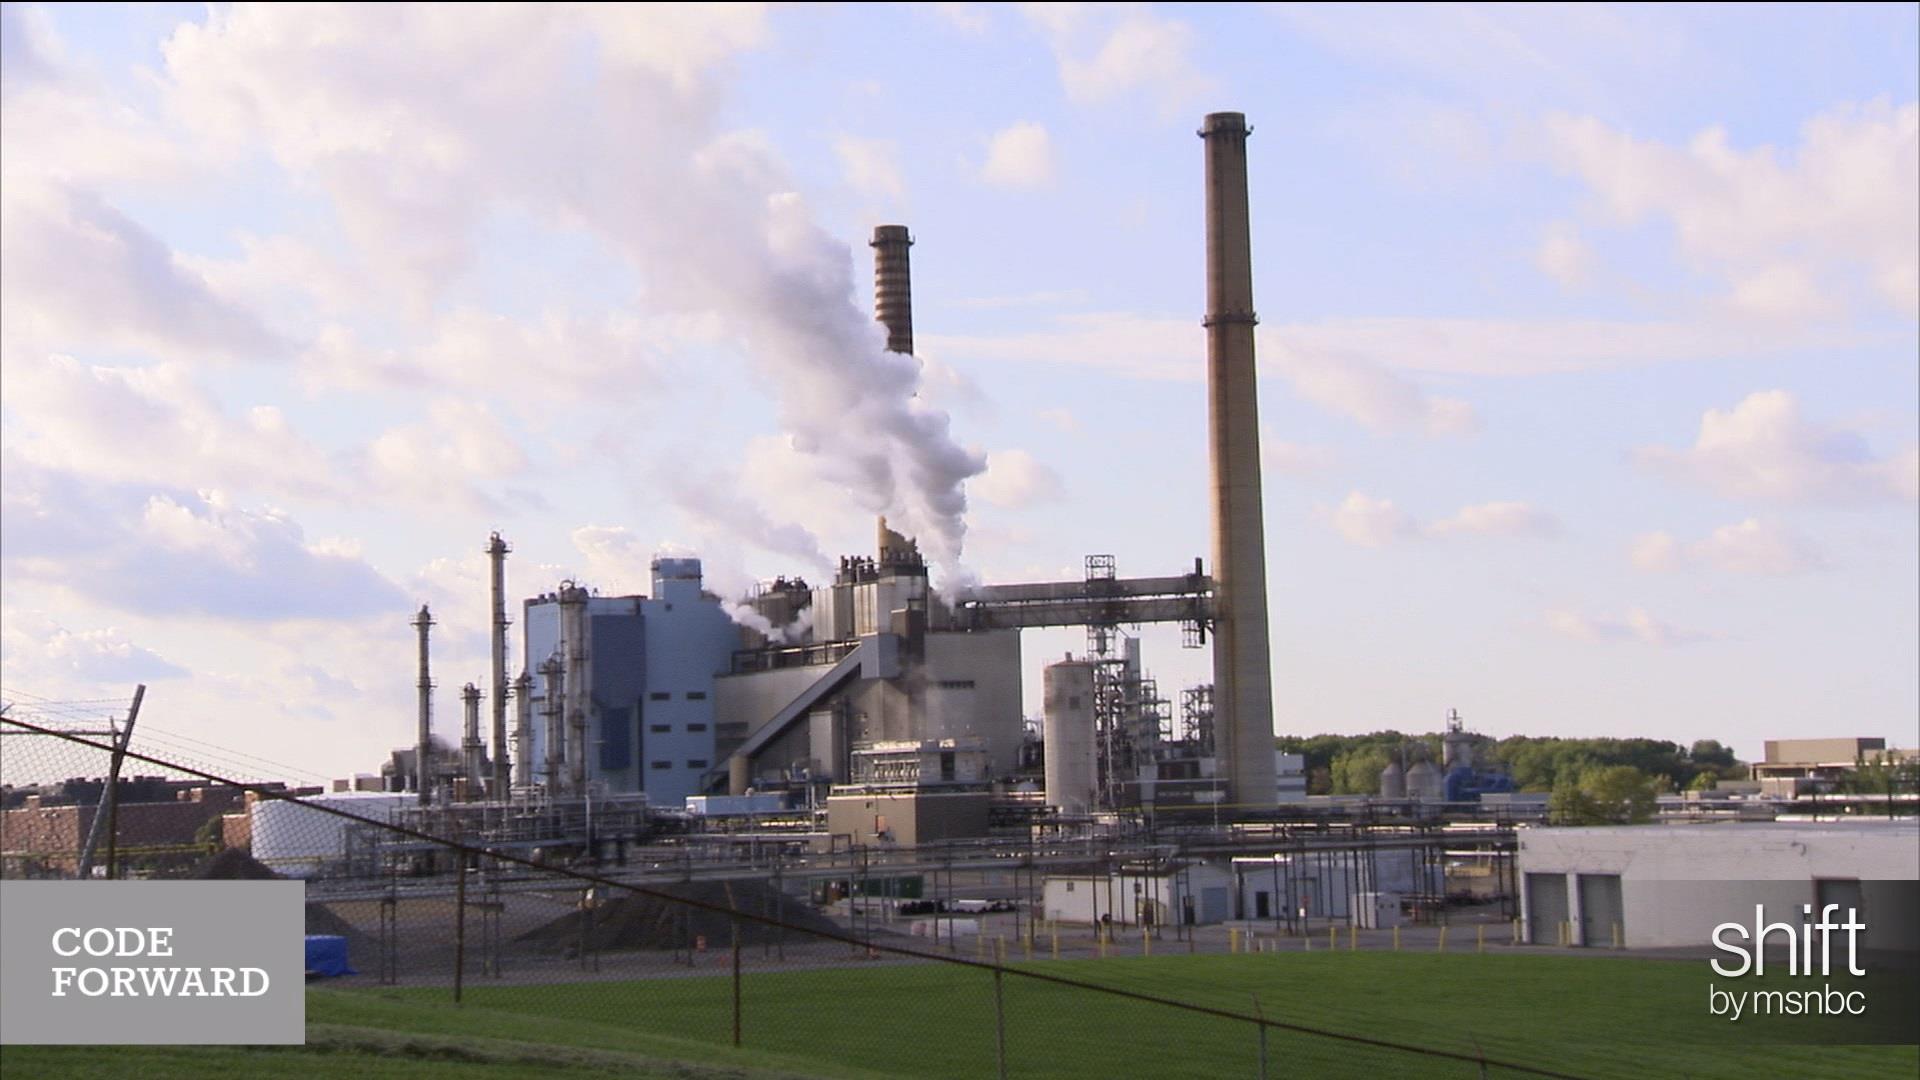 New tech transforms CO2 into usable fuel